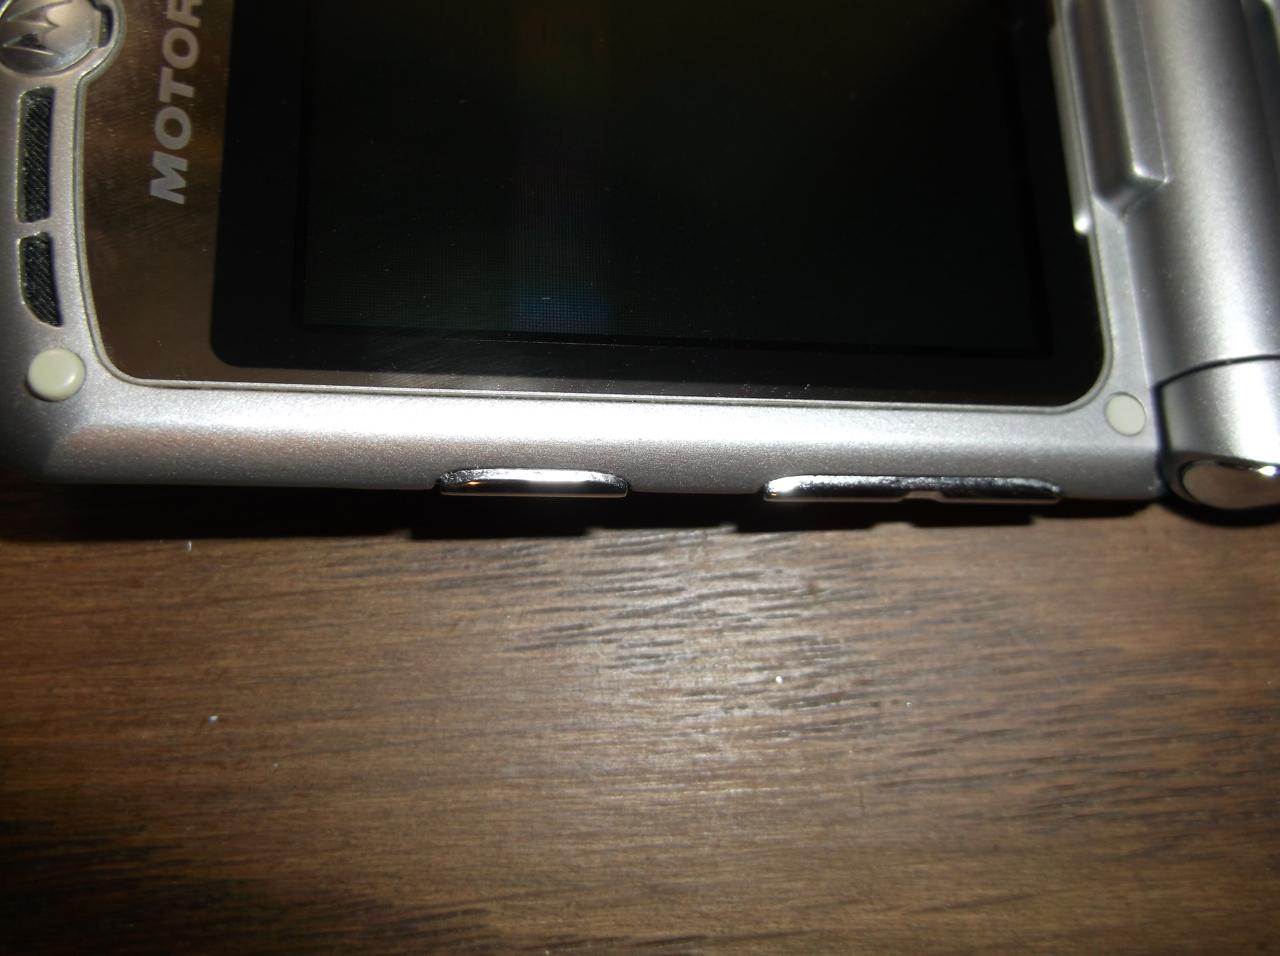 Geek Like Me Too A Counterfeit Motorola Razr V3 Cell Phone